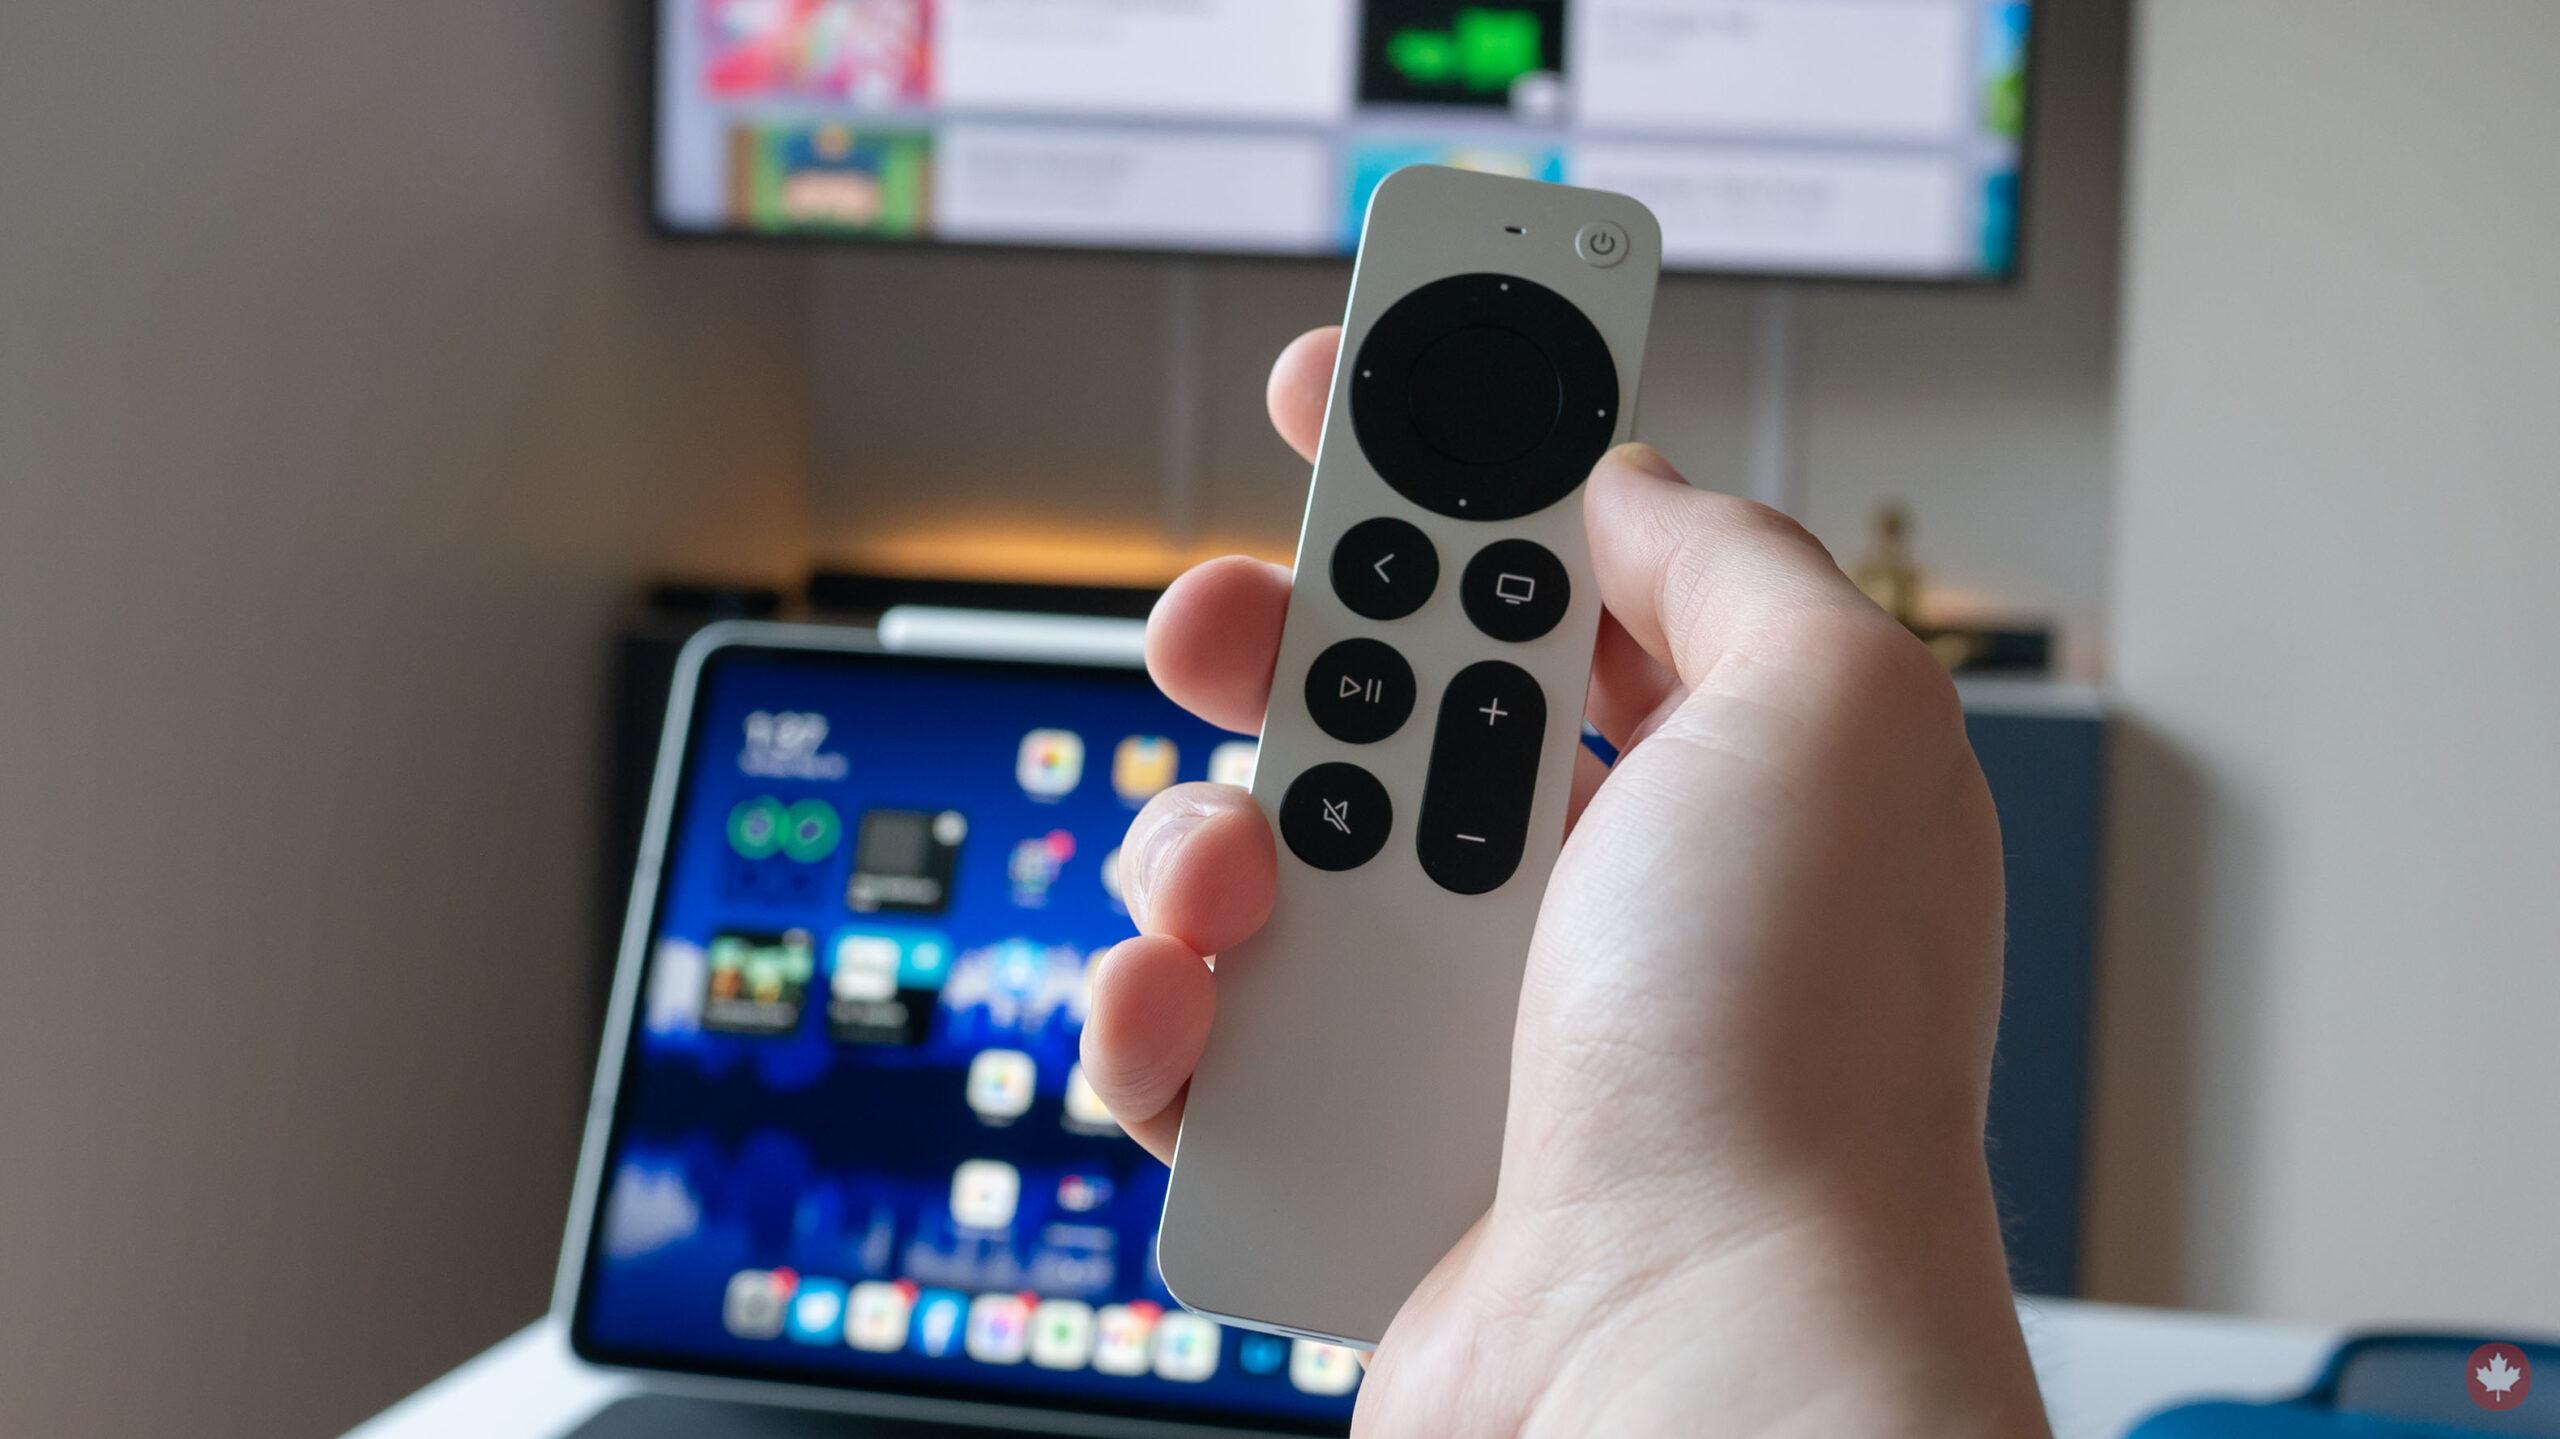 Apple TV 4K (2021) remote